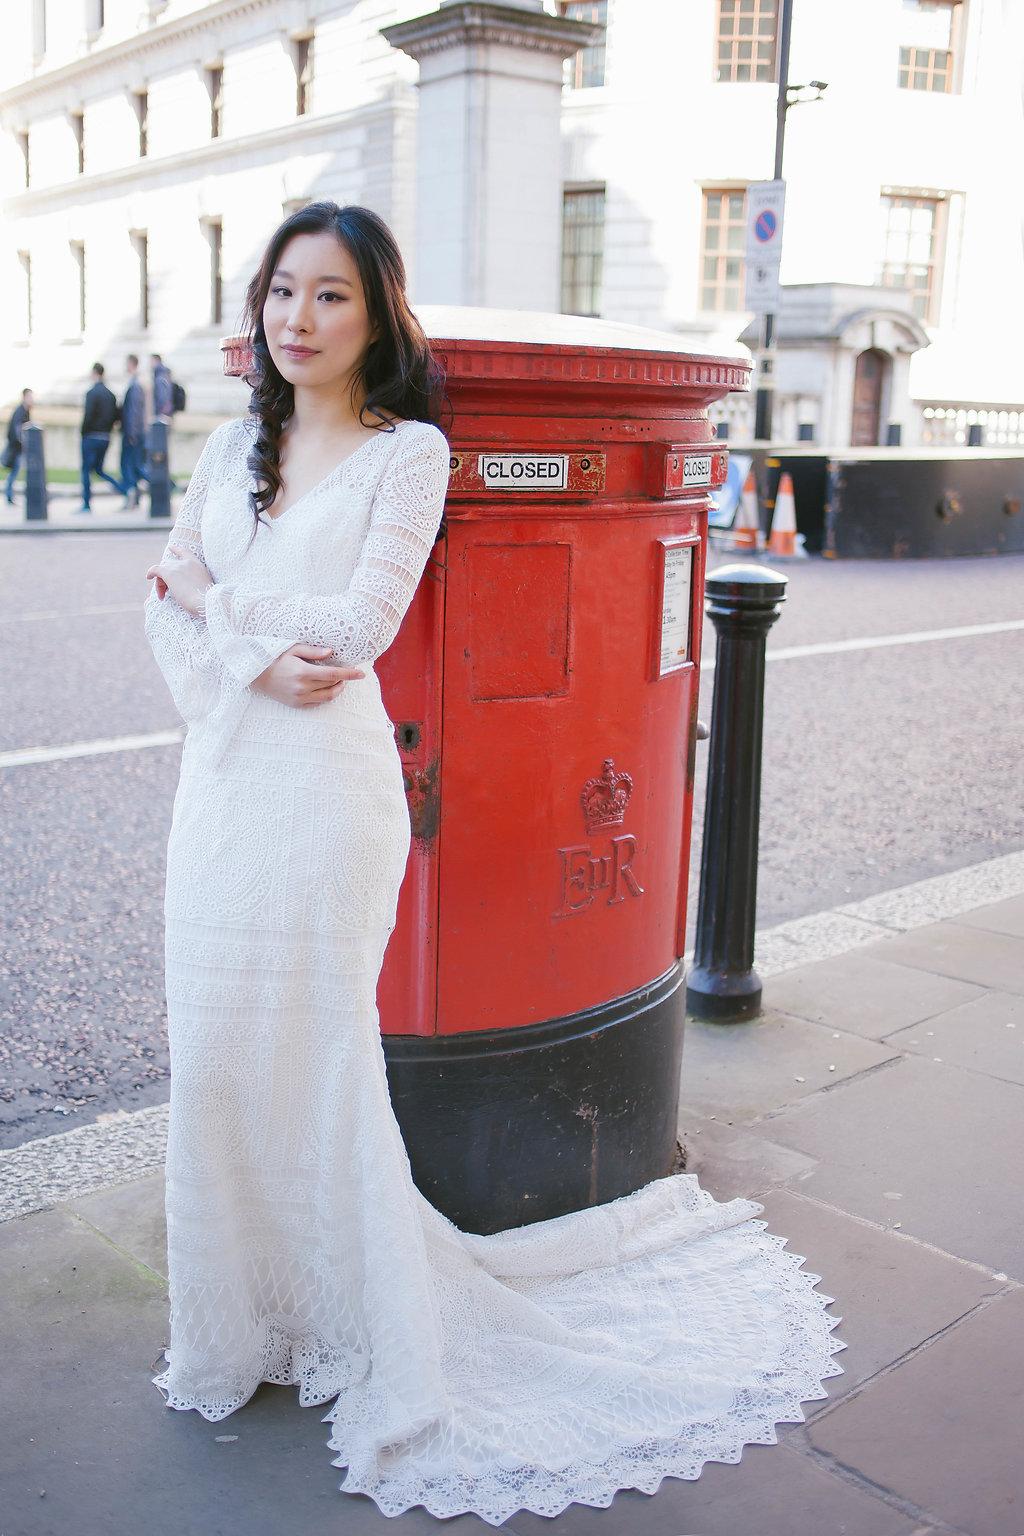 Nina Pang Photography - City Bride - London wedding - City wedding - Chinese wedding 3